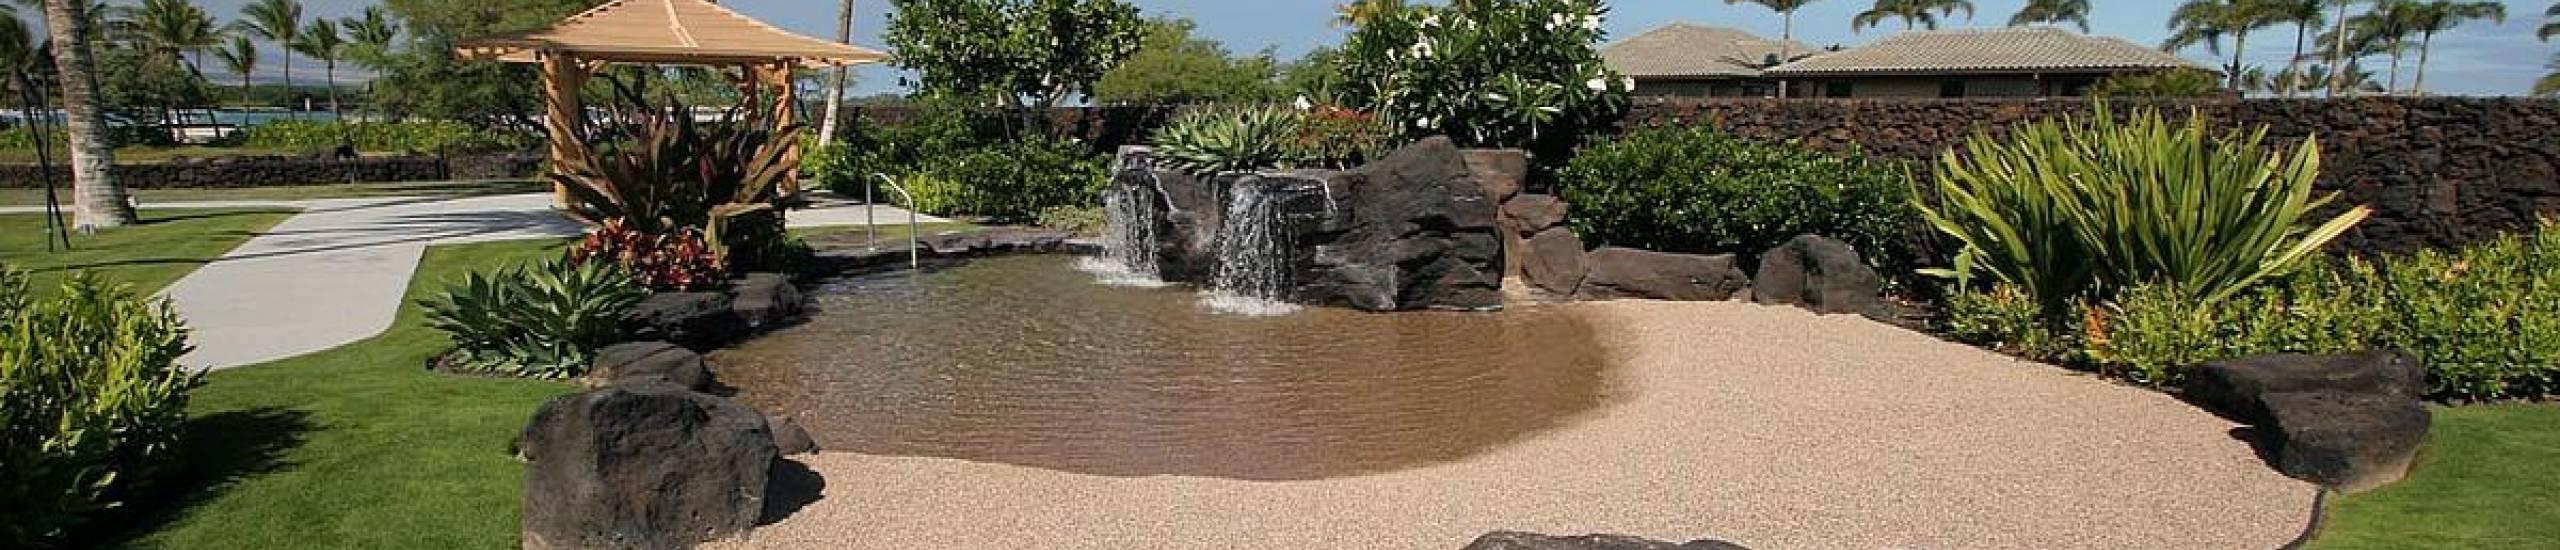 Kolea at Waikoloa Amenity Center Children's Pool